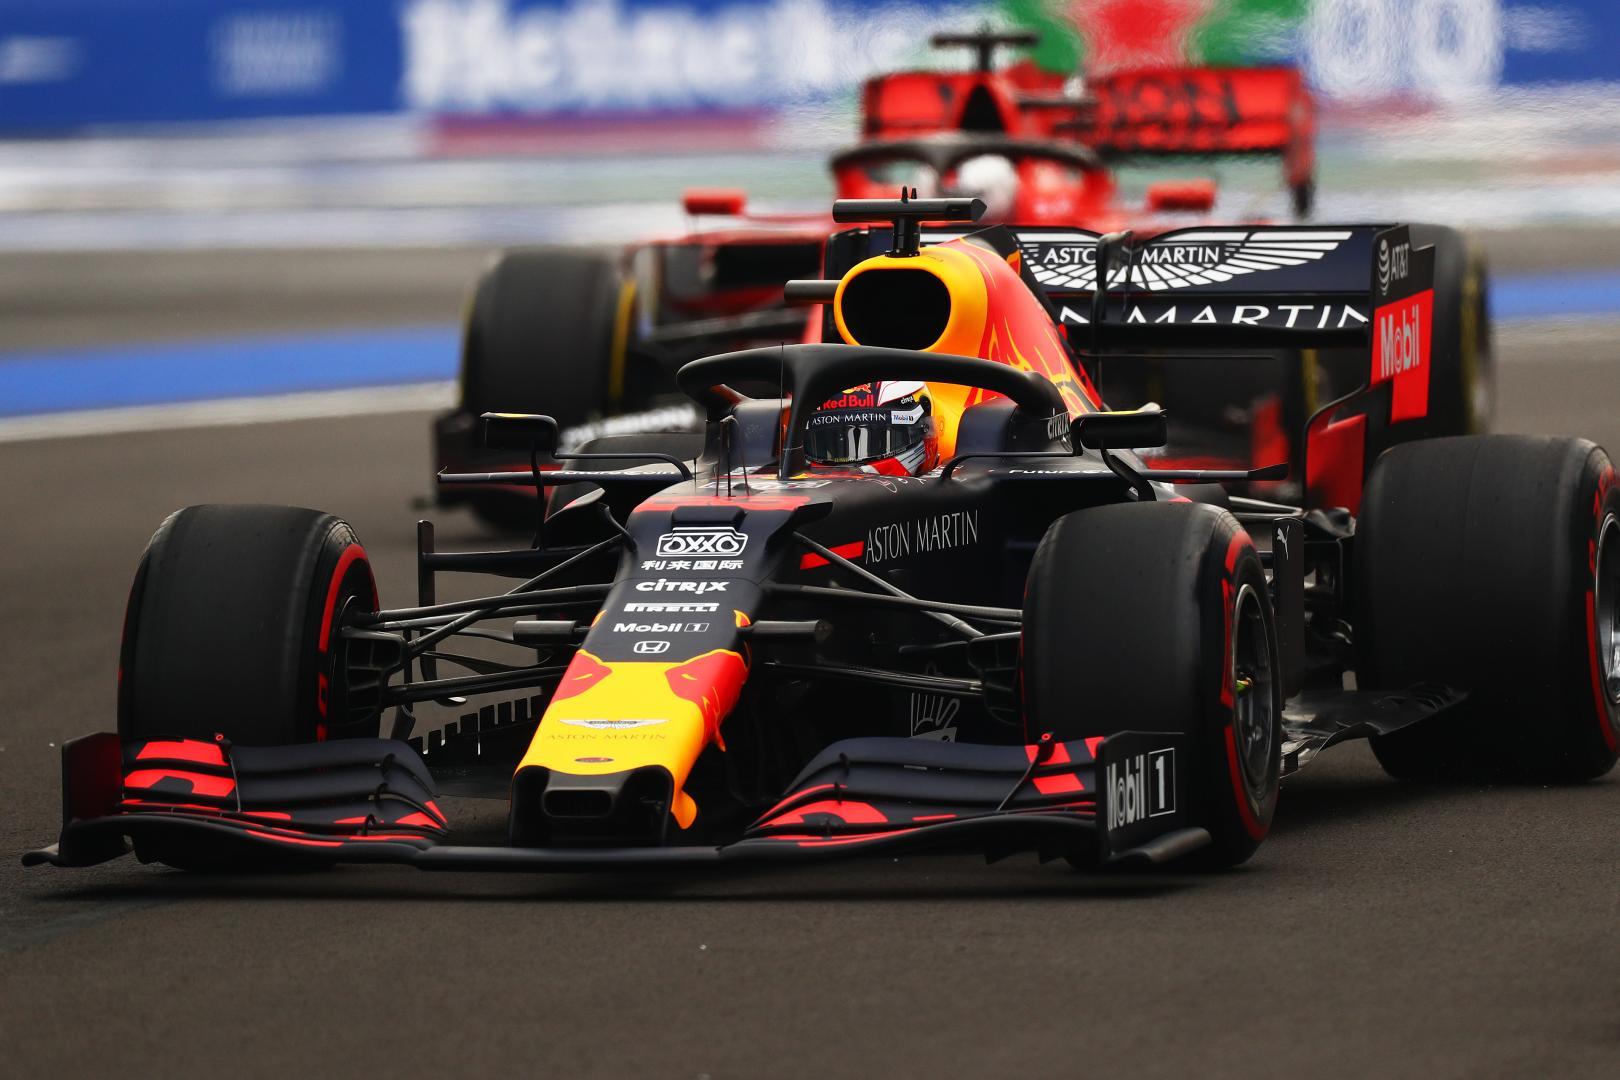 2e vrije training van de GP van Mexico 2019